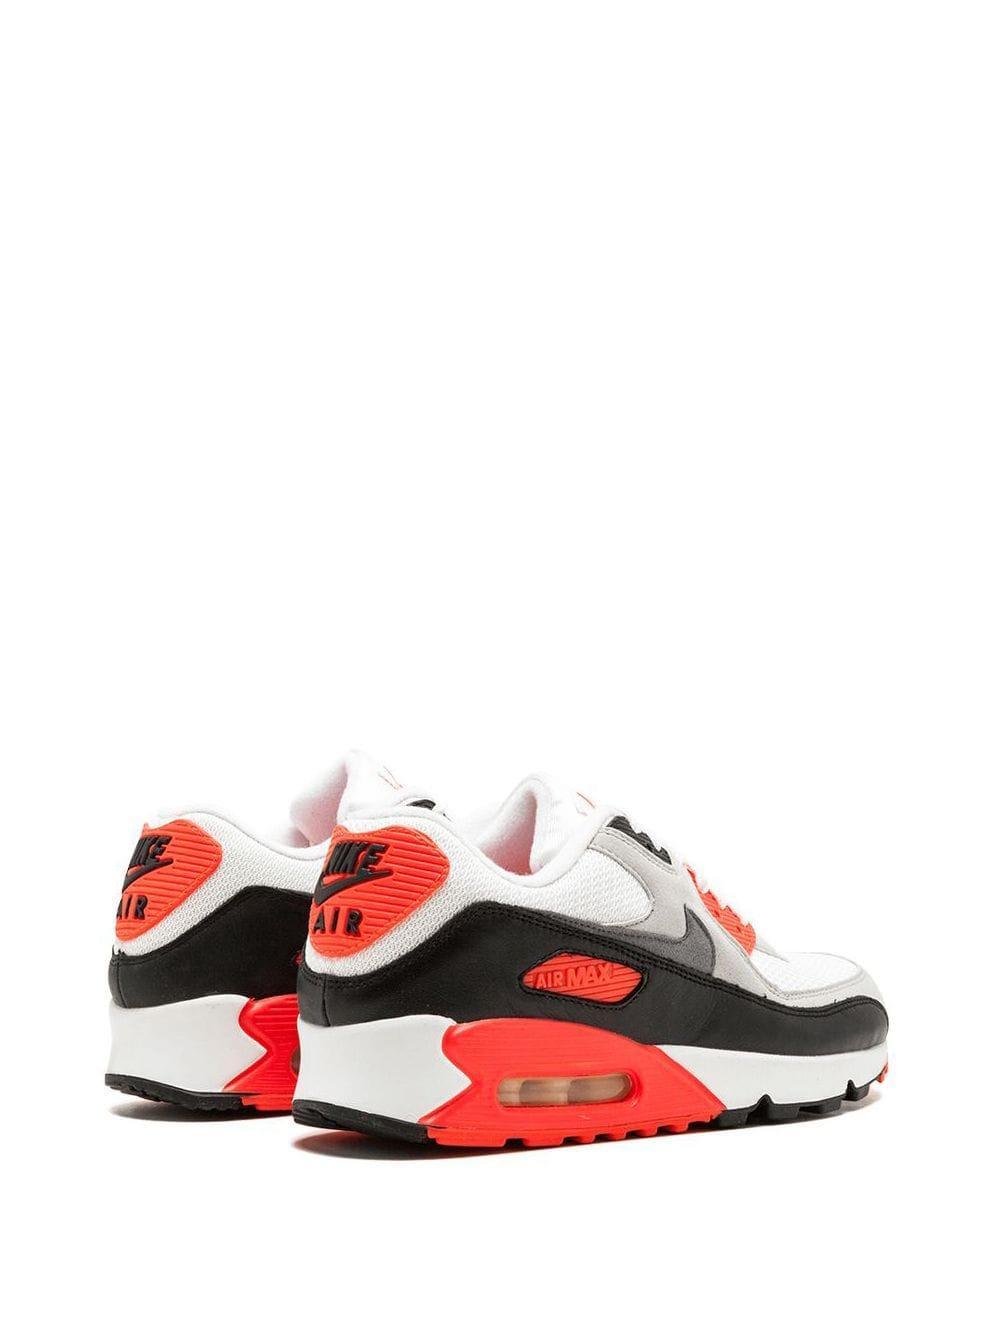 Zapatillas Air Max 90 OG Nike de Caucho de color Blanco para hombre